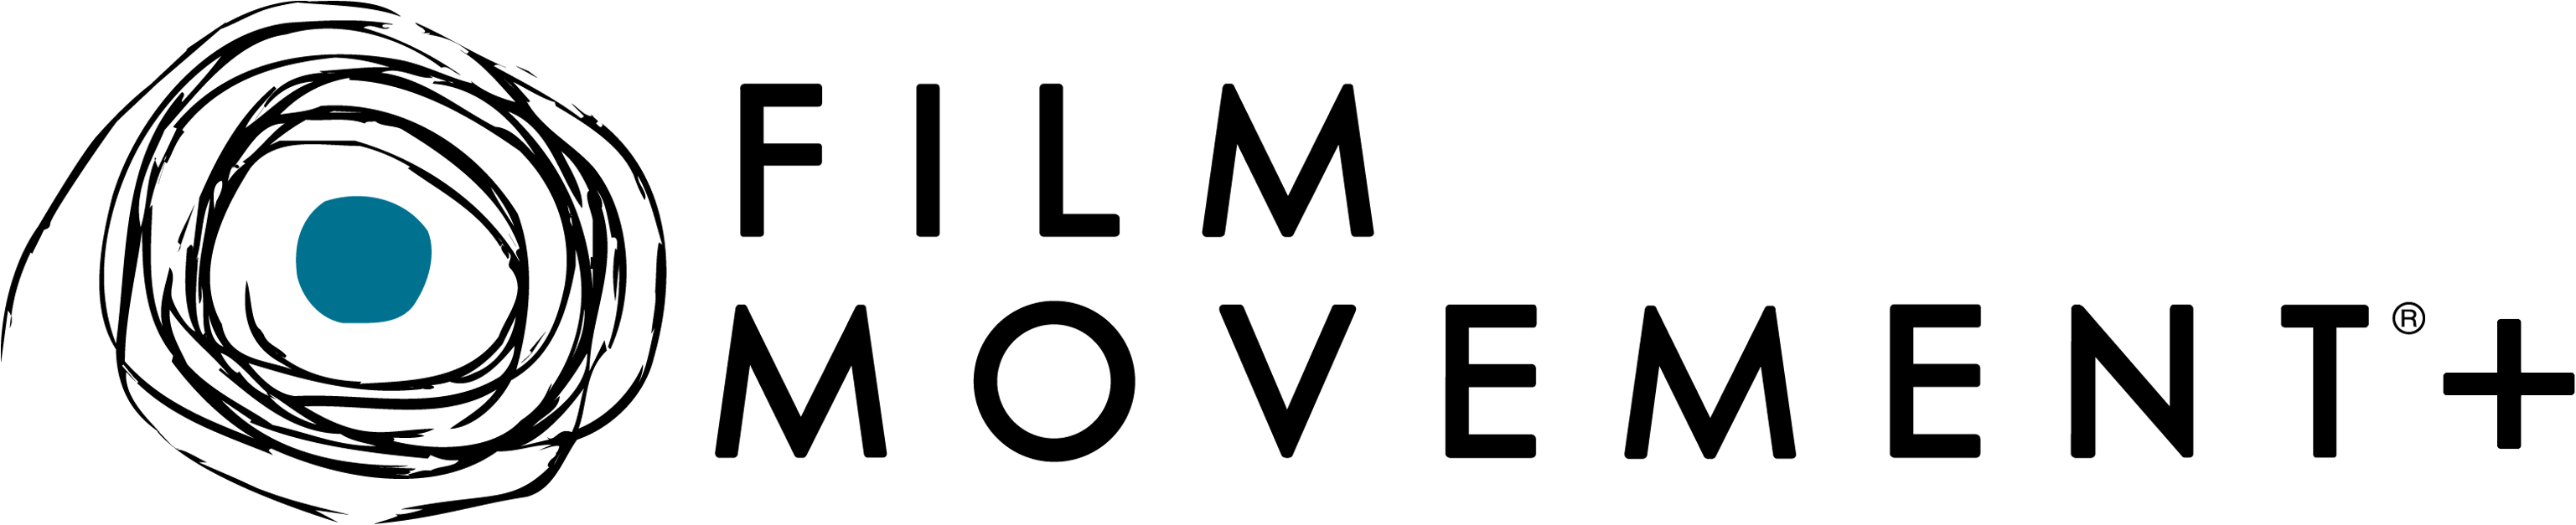 Film Movement +_logo_color_black+